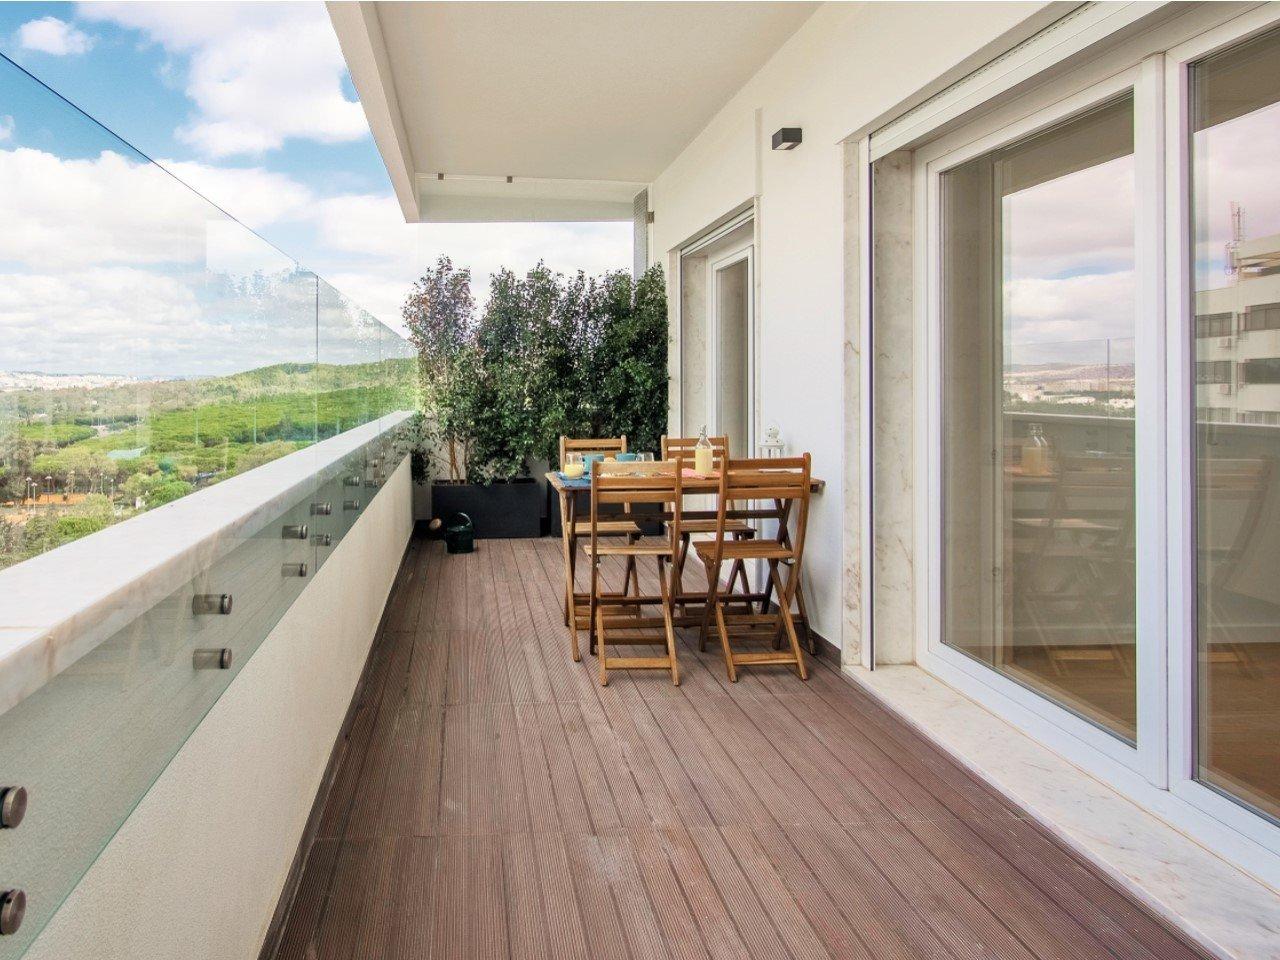 2 Bedroom Apartment Lisbon, Lisbon Ref: AAM229